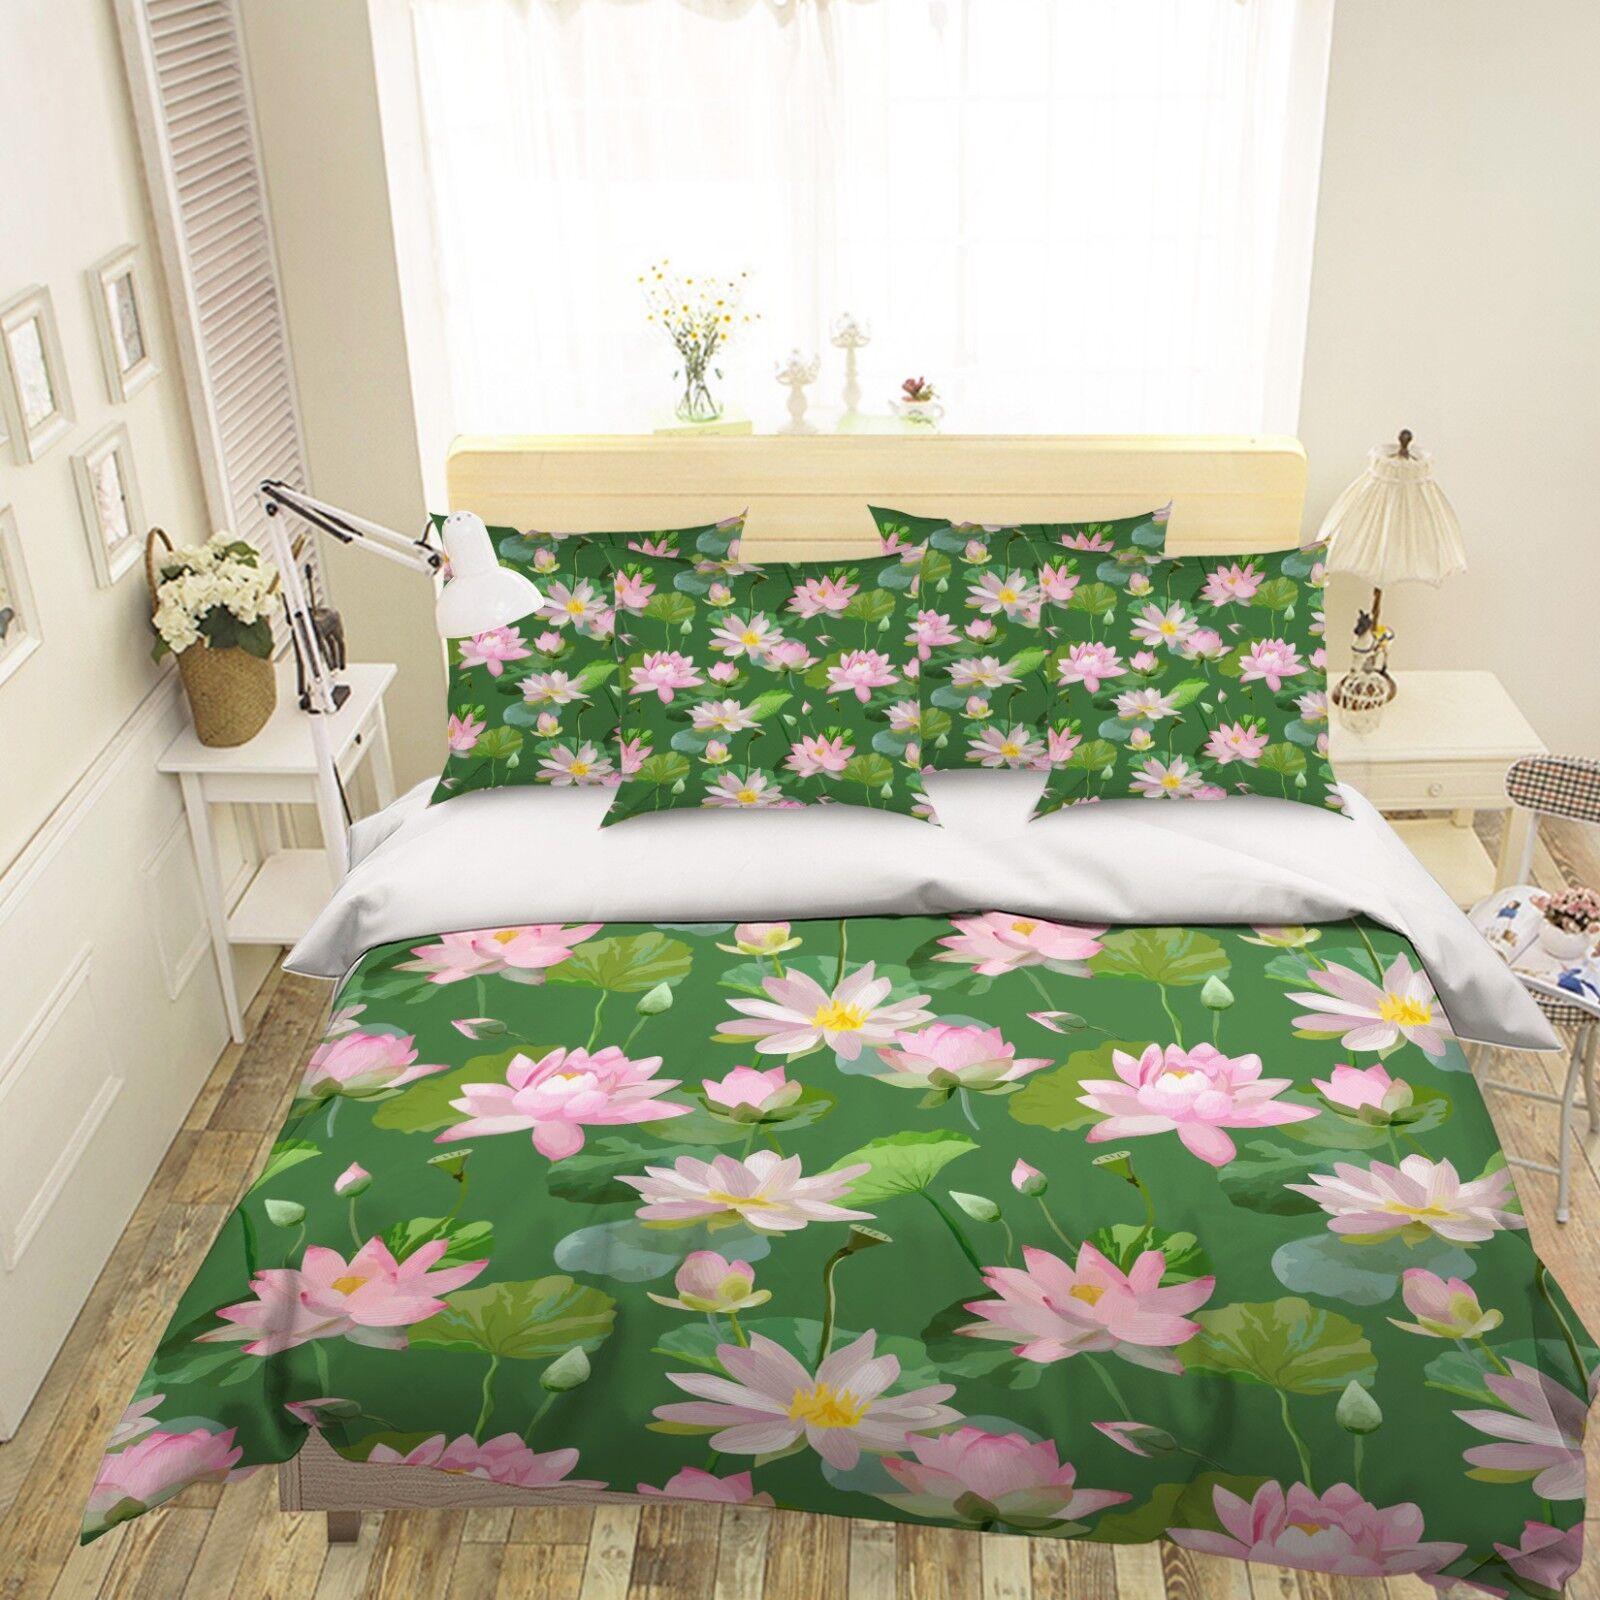 3D Pond Lotus 577 Bed Pillowcases Quilt Duvet Cover Set Single Queen AU Carly